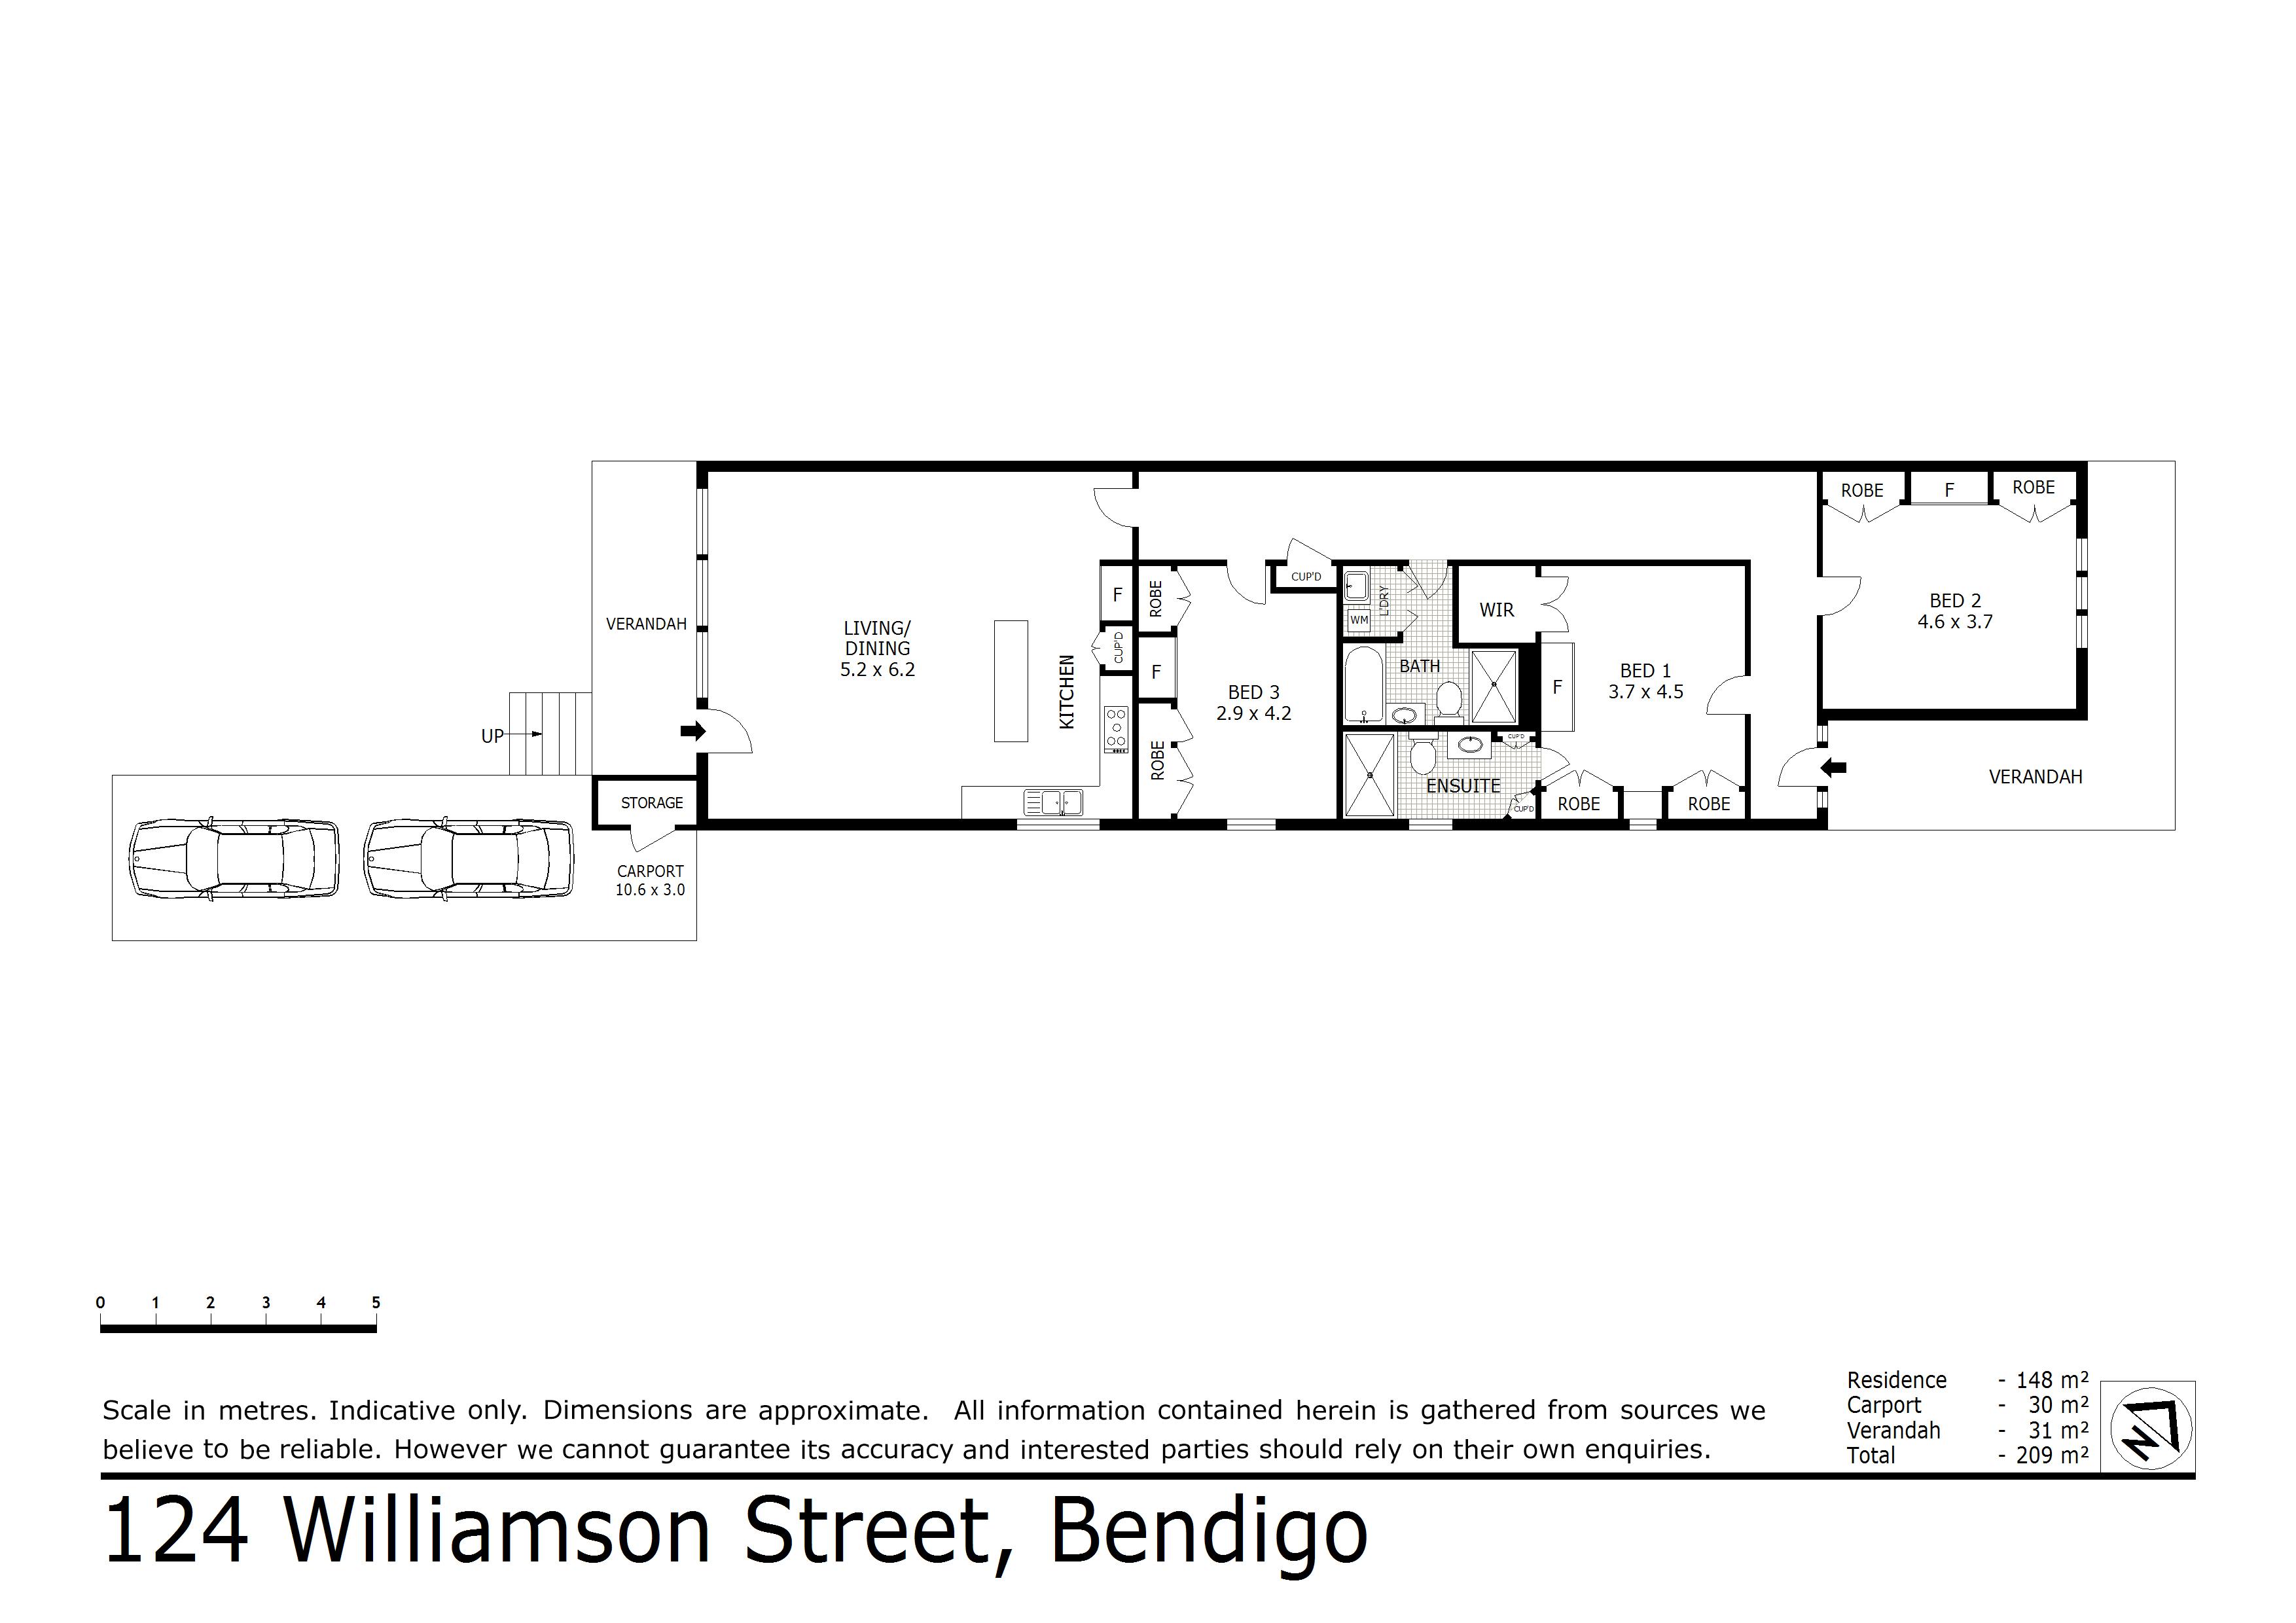 124 Williamson Street, Bendigo, VIC 3550